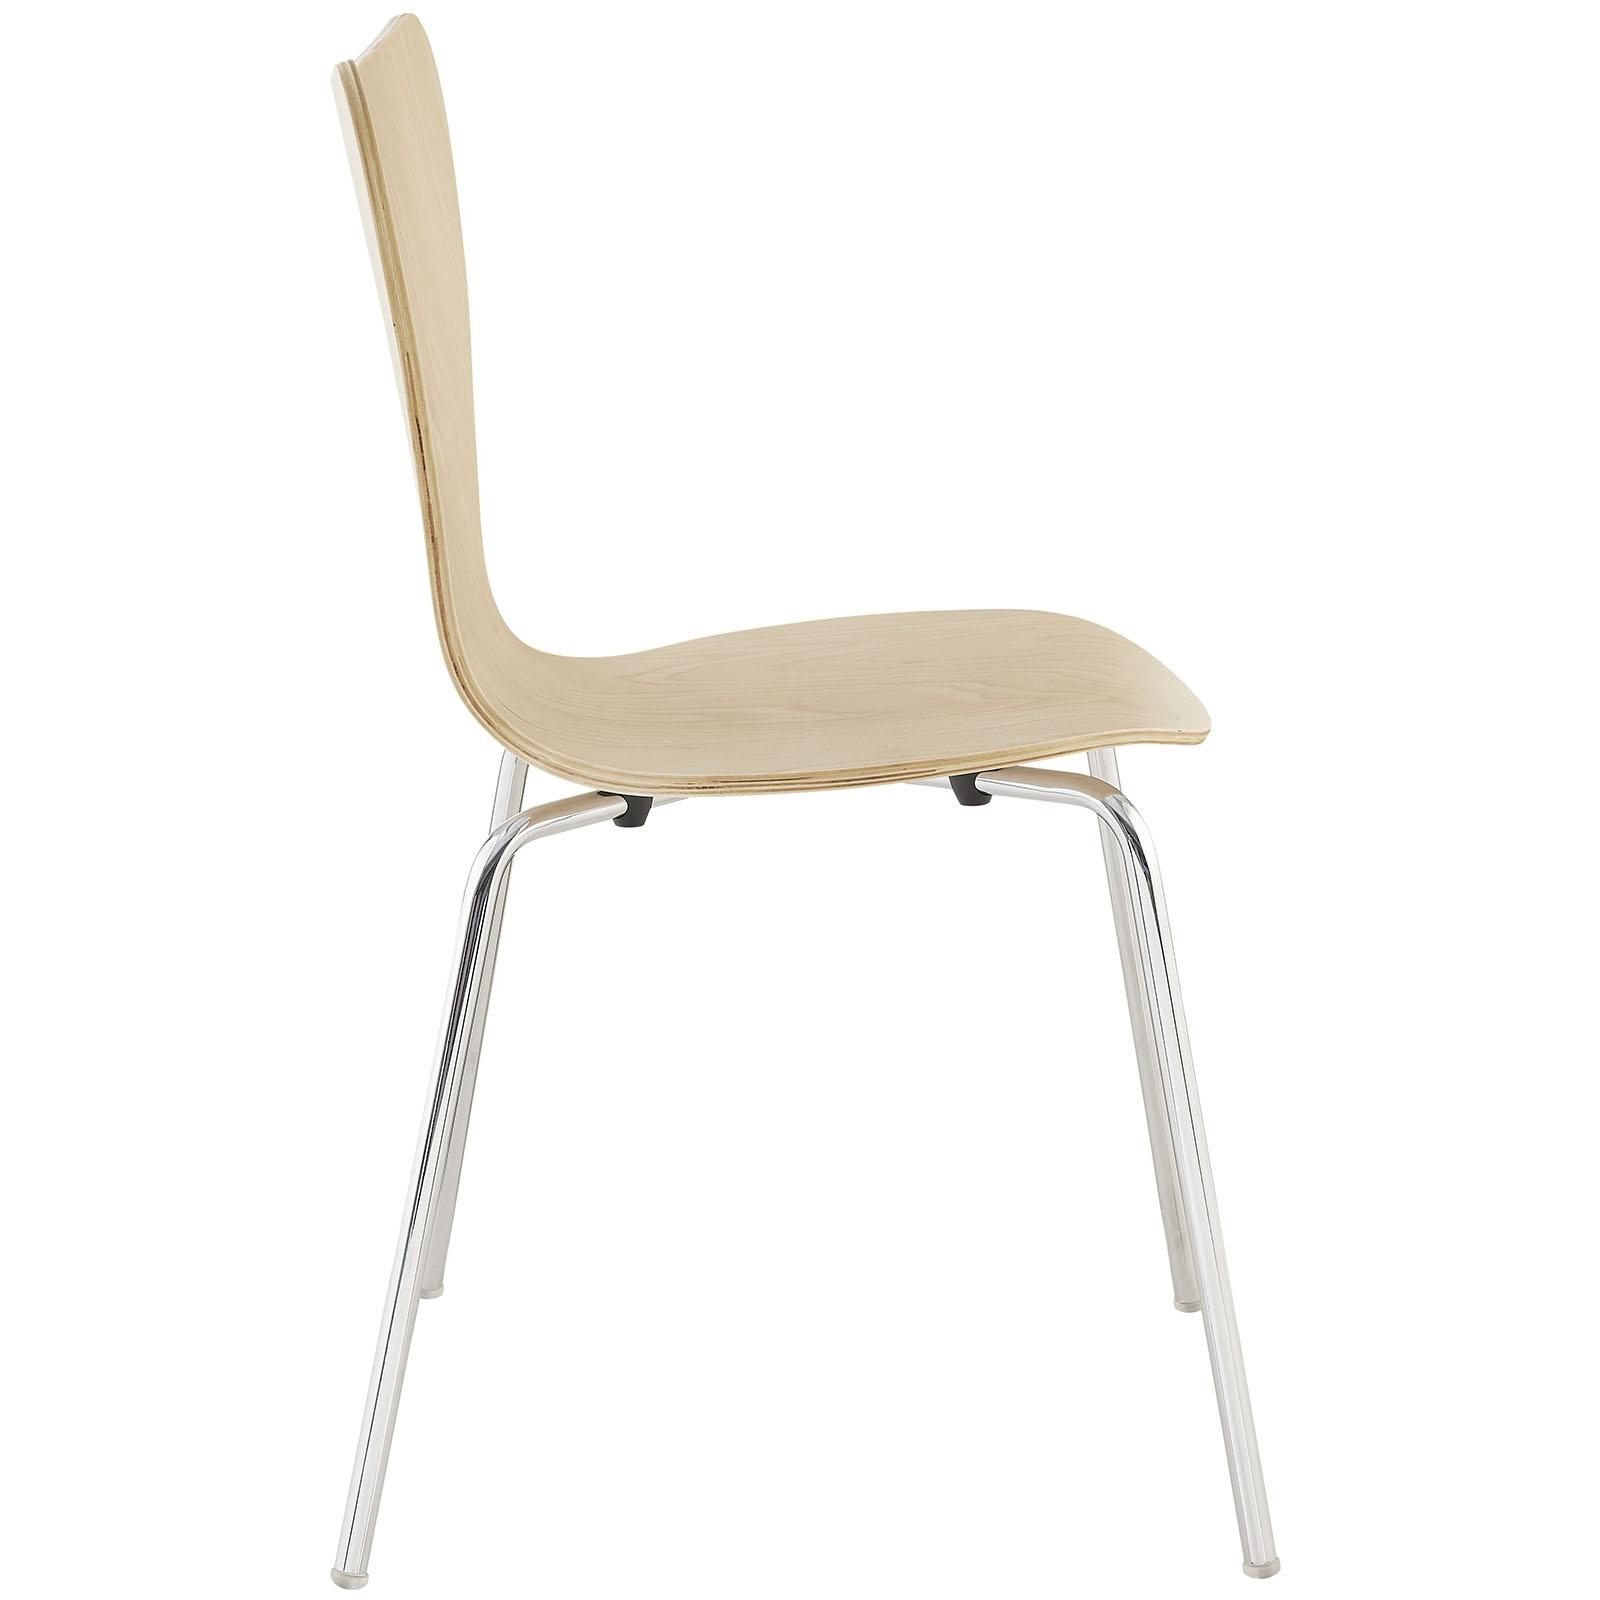 Wooden chair side Dark Wood Dining Wooden Chair Side View Cubicles Nila Dining Wooden Chair